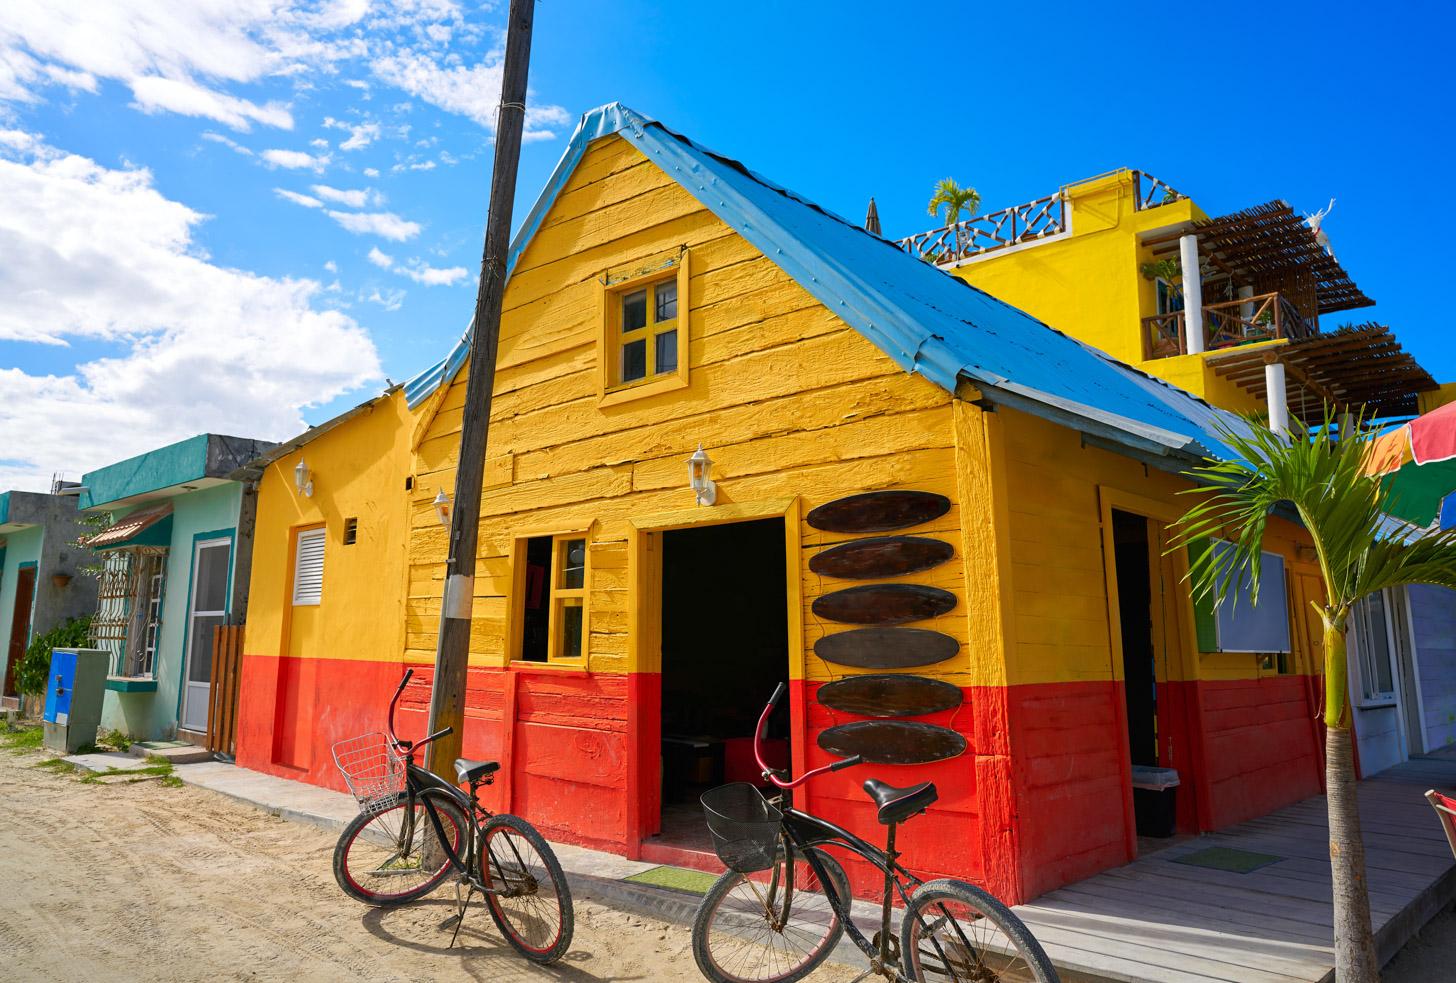 Kleurige huisjes op Isla Holbox